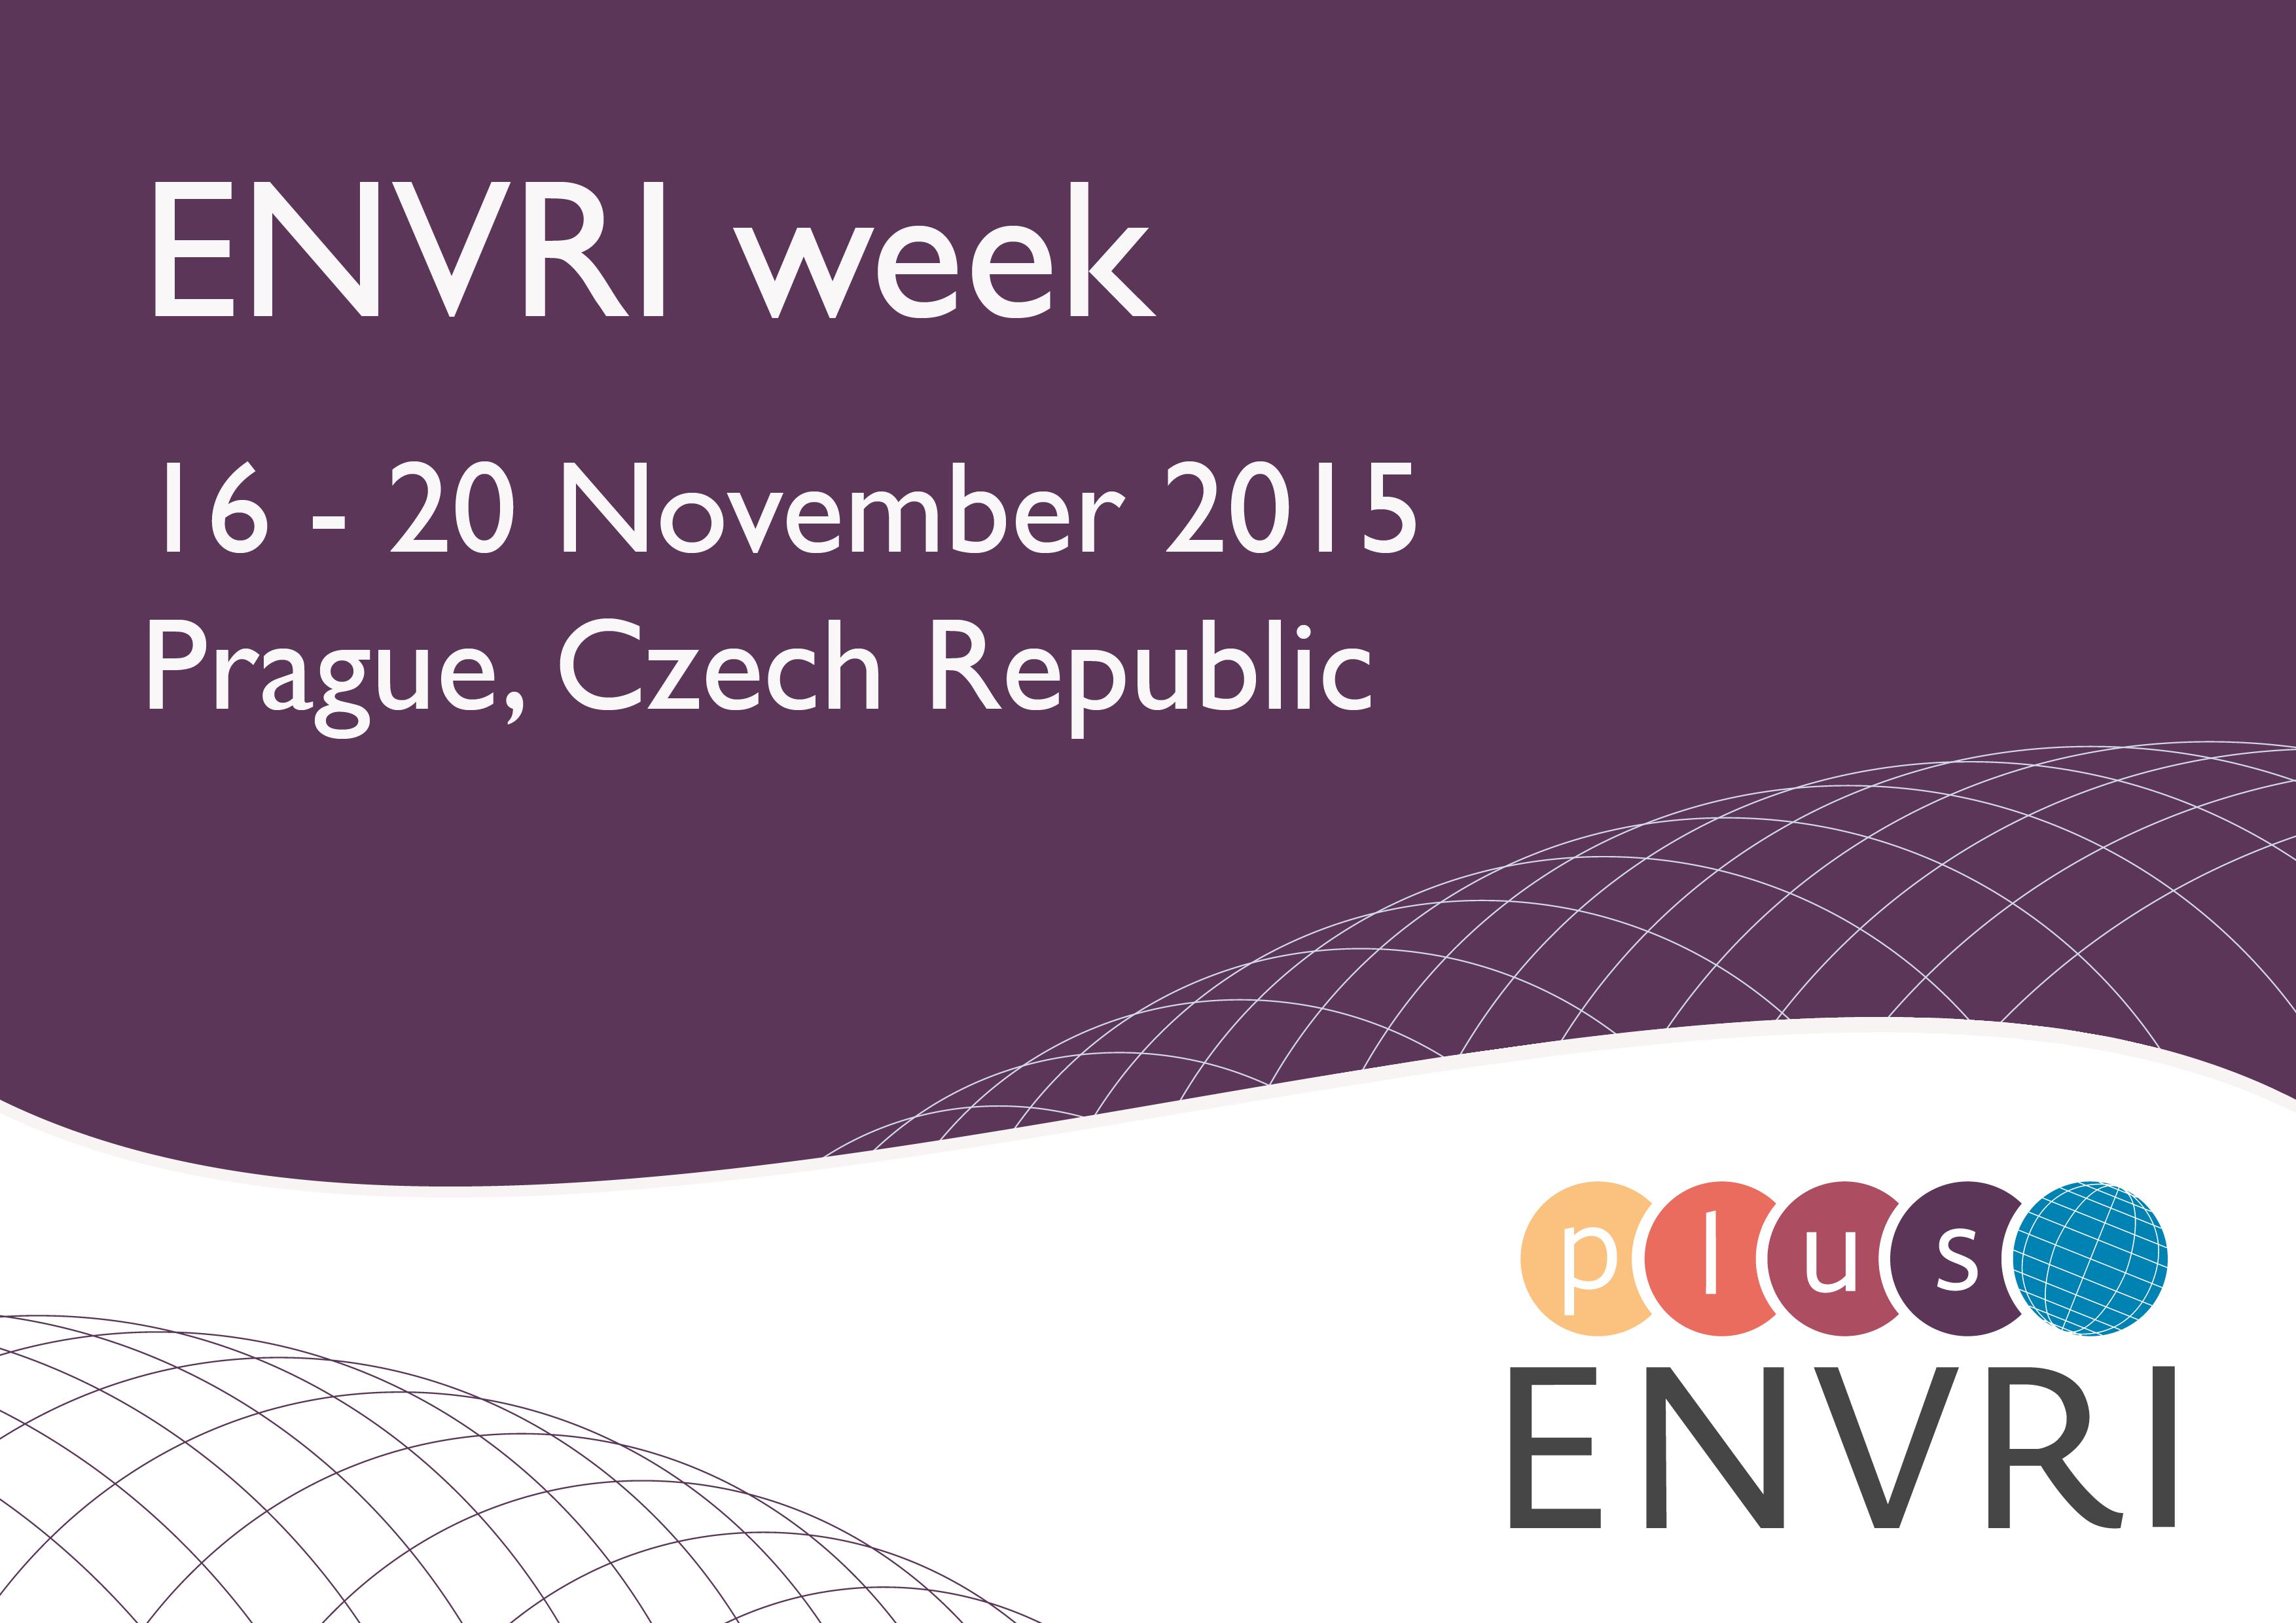 ENVRI week invitation